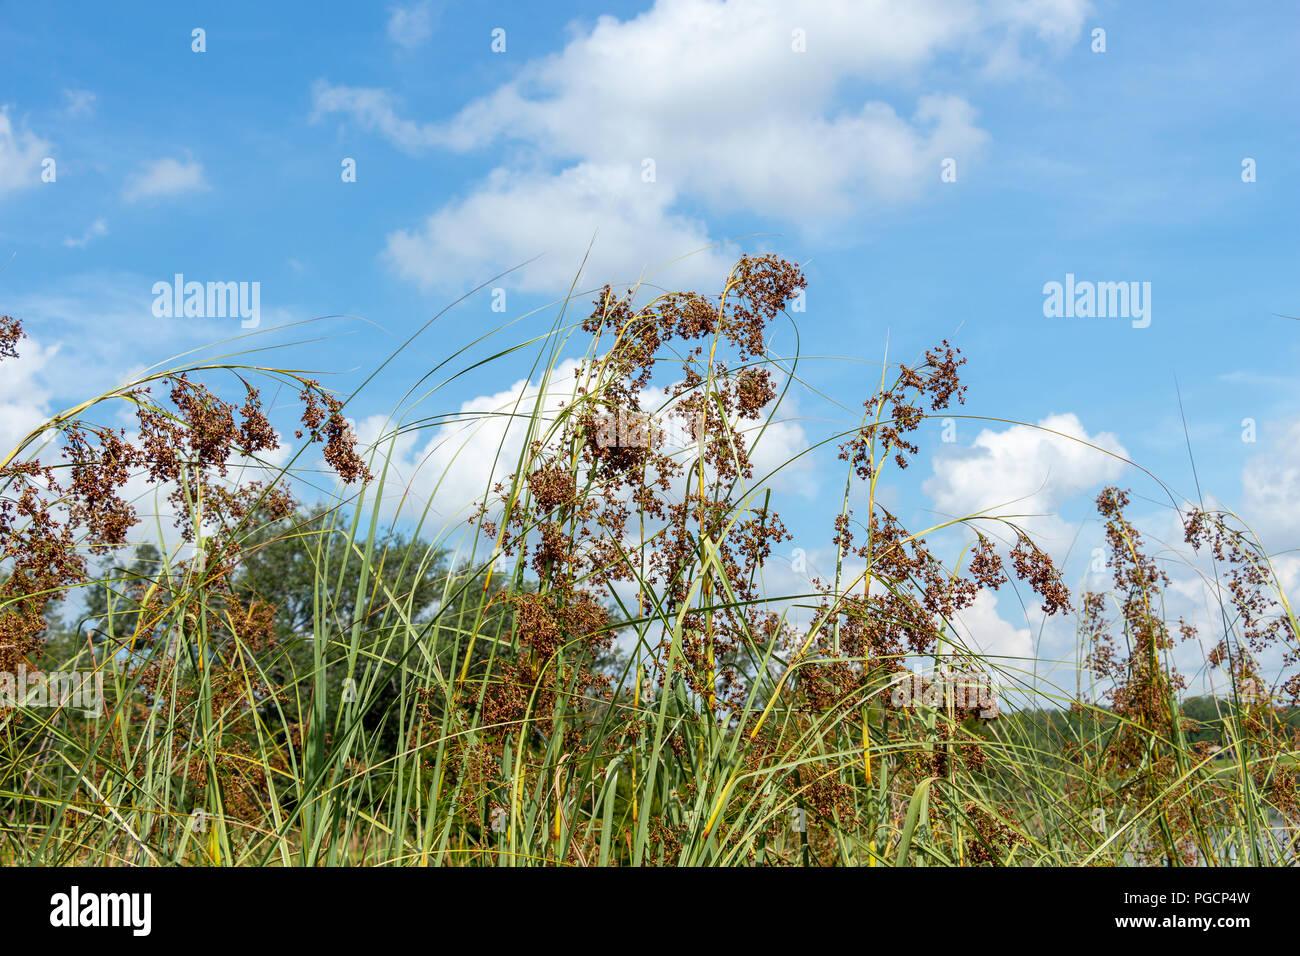 Sawgrass (Cladium jamaicense), flowering - Topeekeegee Yugnee (TY) Park, Hollywood, Florida, USA - Stock Image